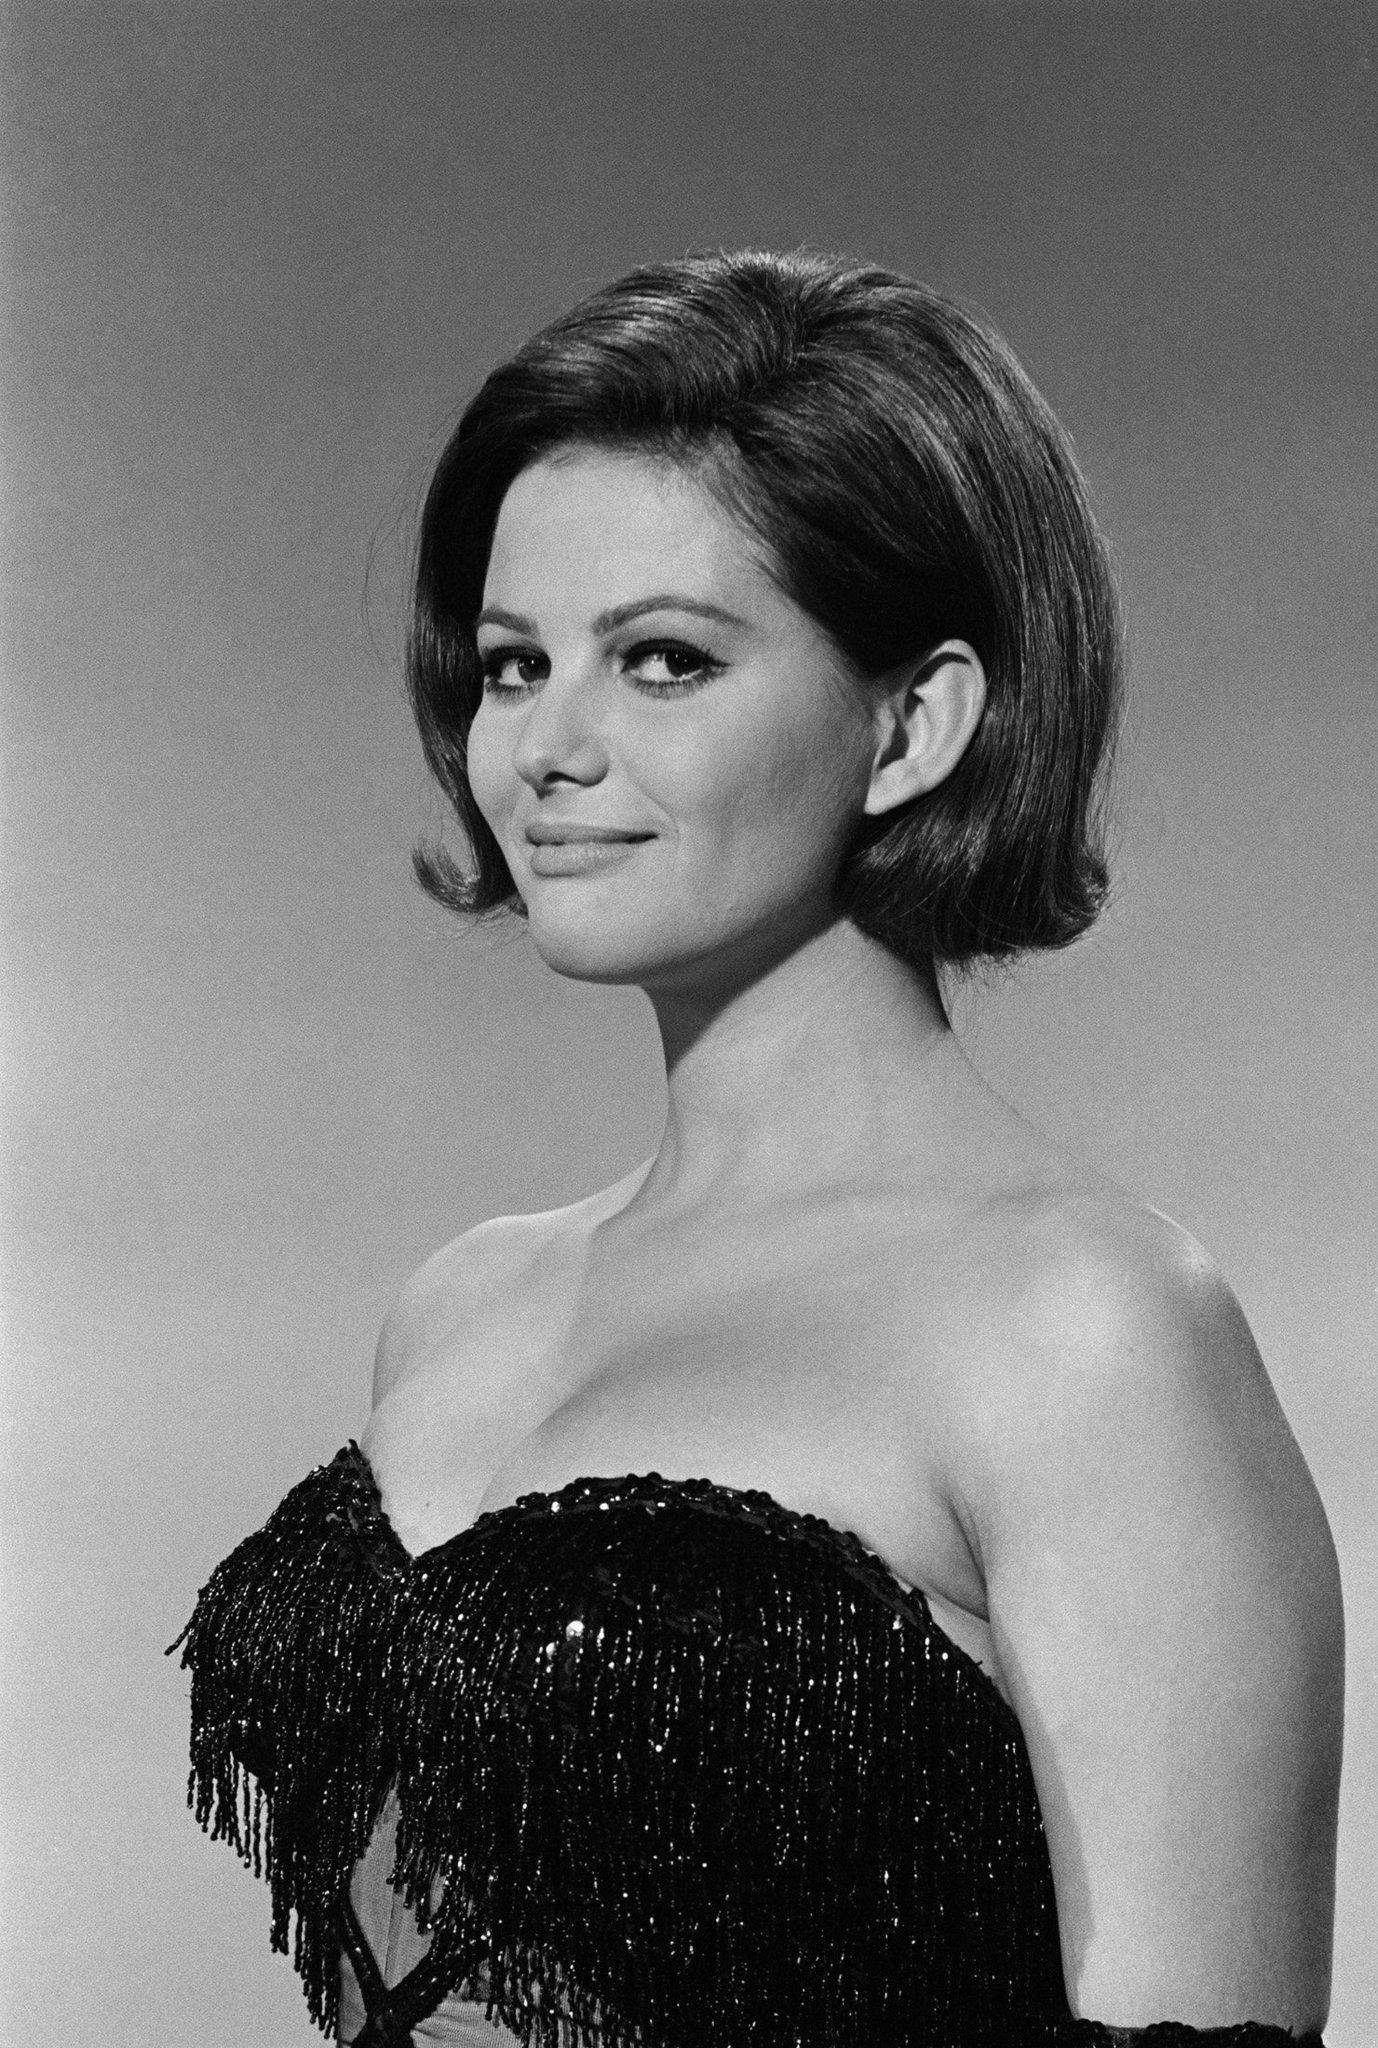 Happy Birthday, Claudia Cardinale! Born 15 April 1938 in Tunis, Tunisia